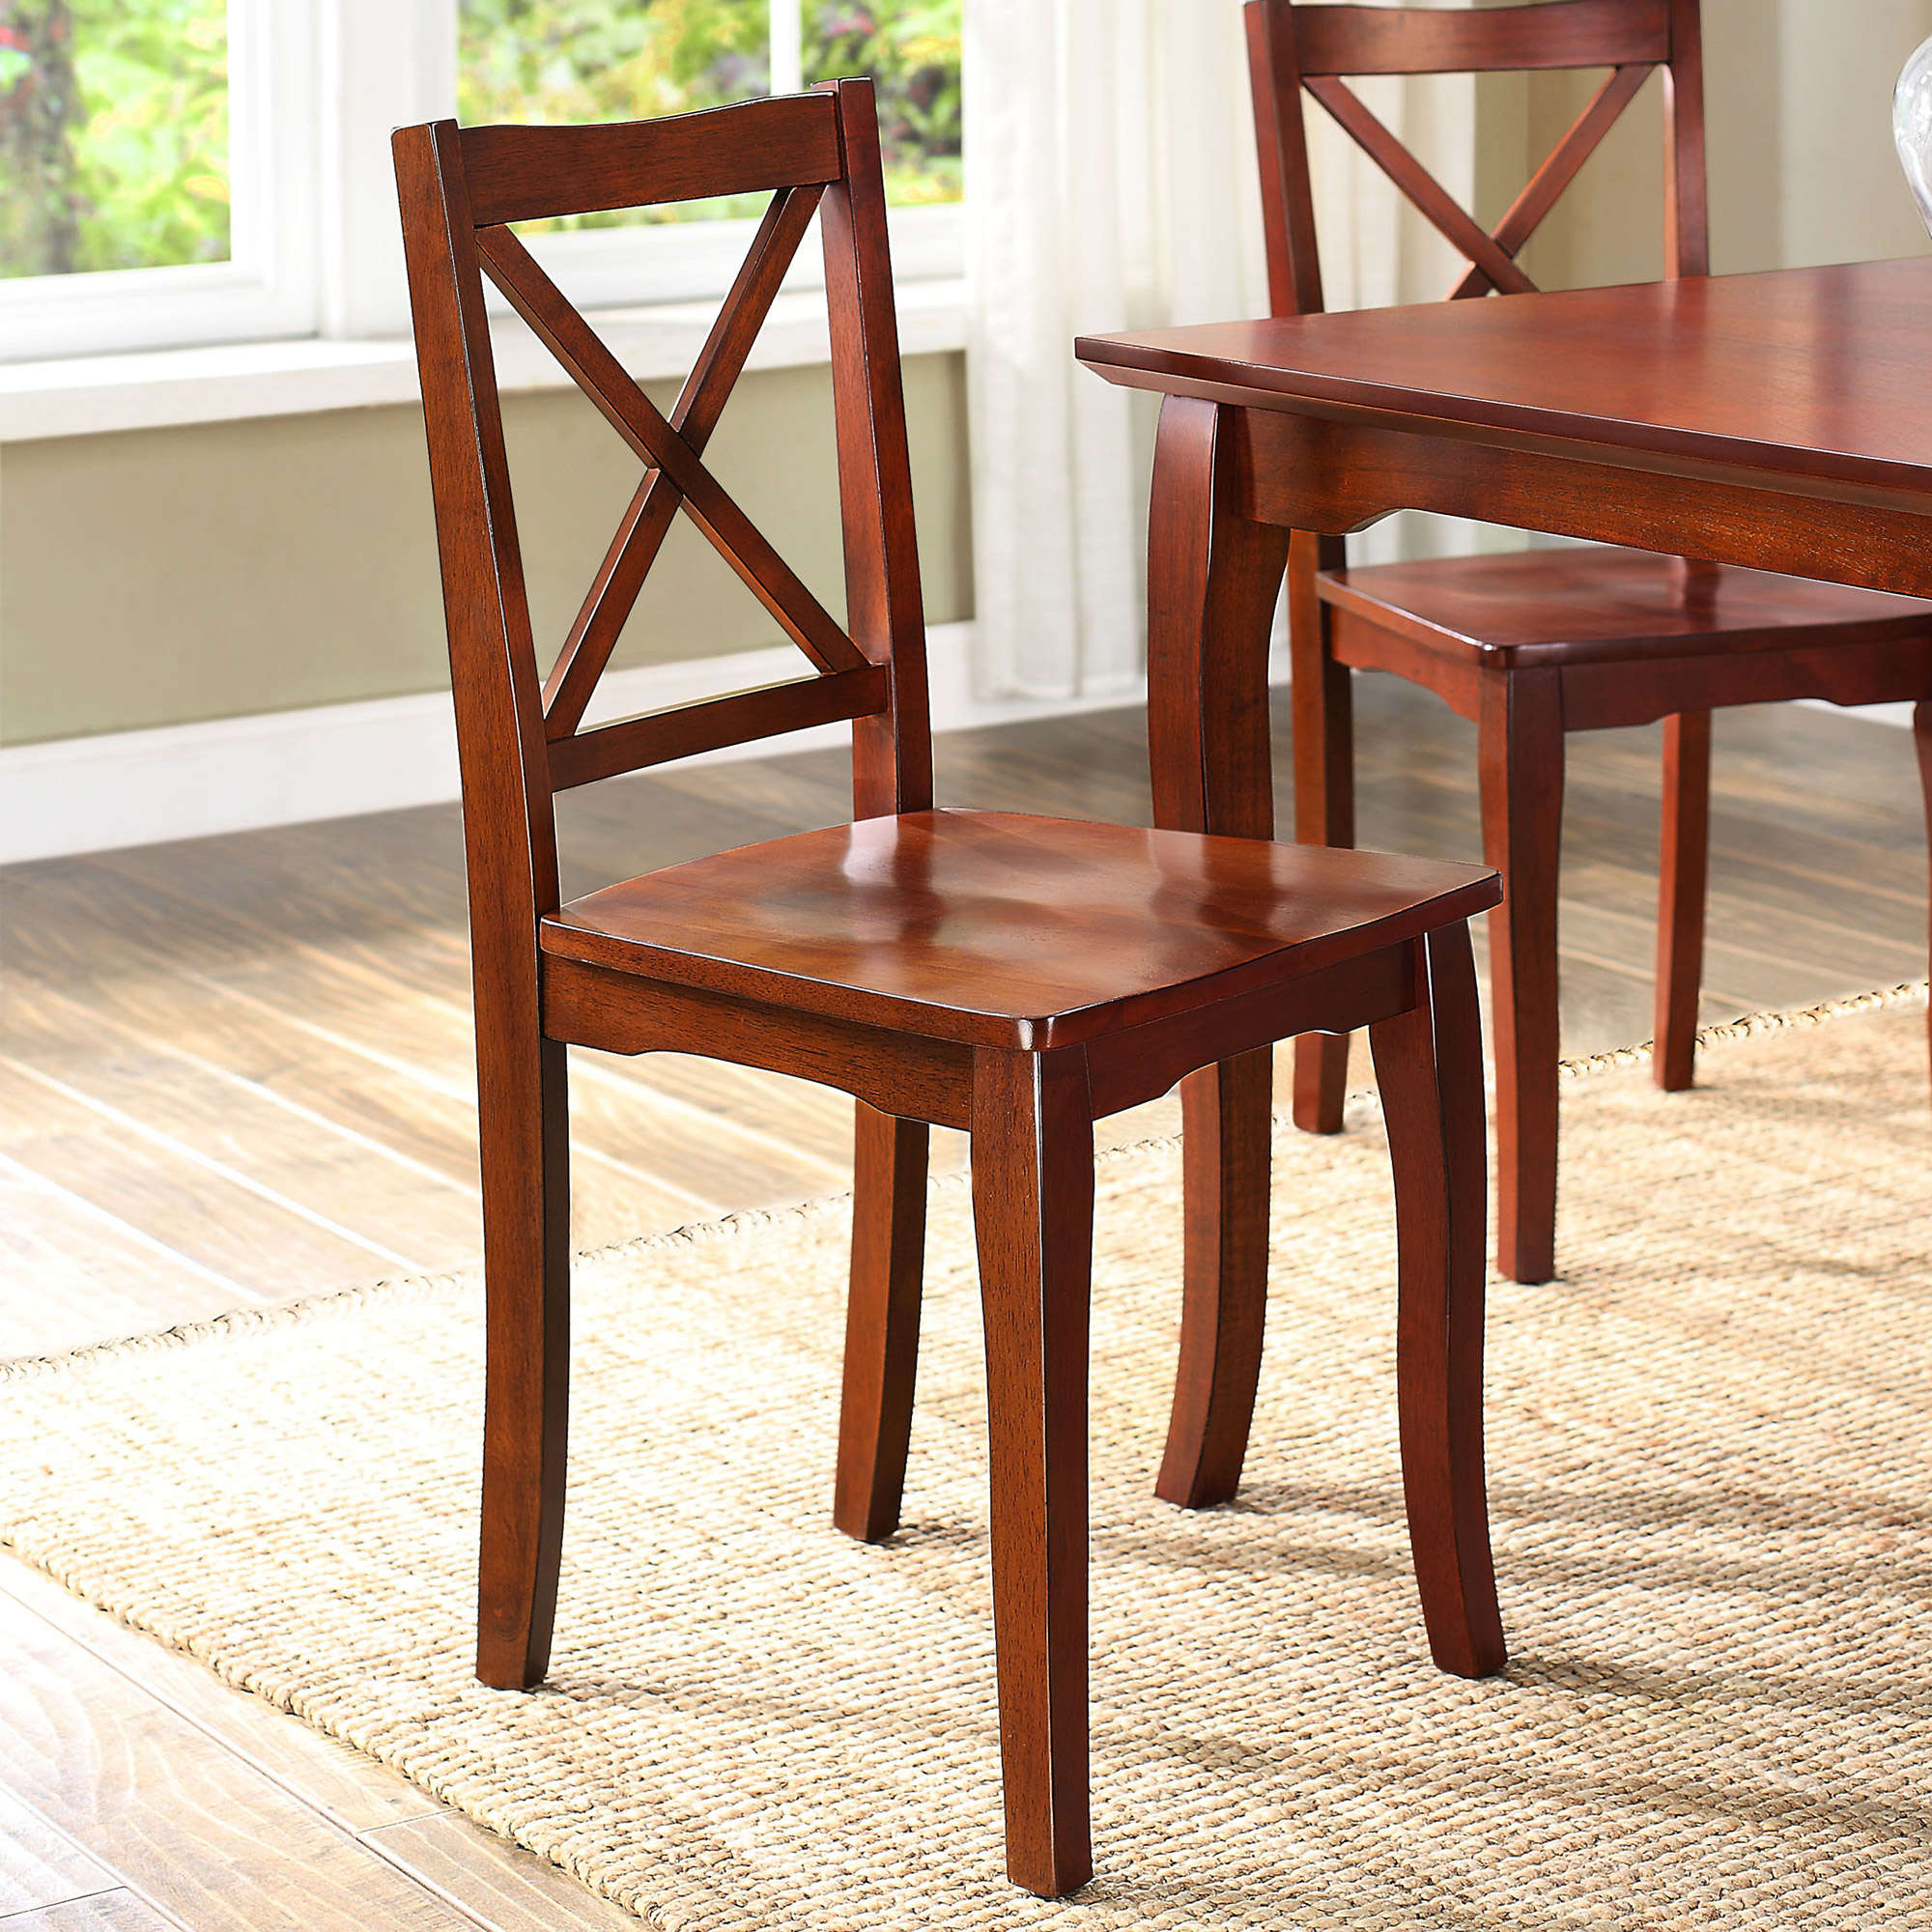 Ash Wood Furniture